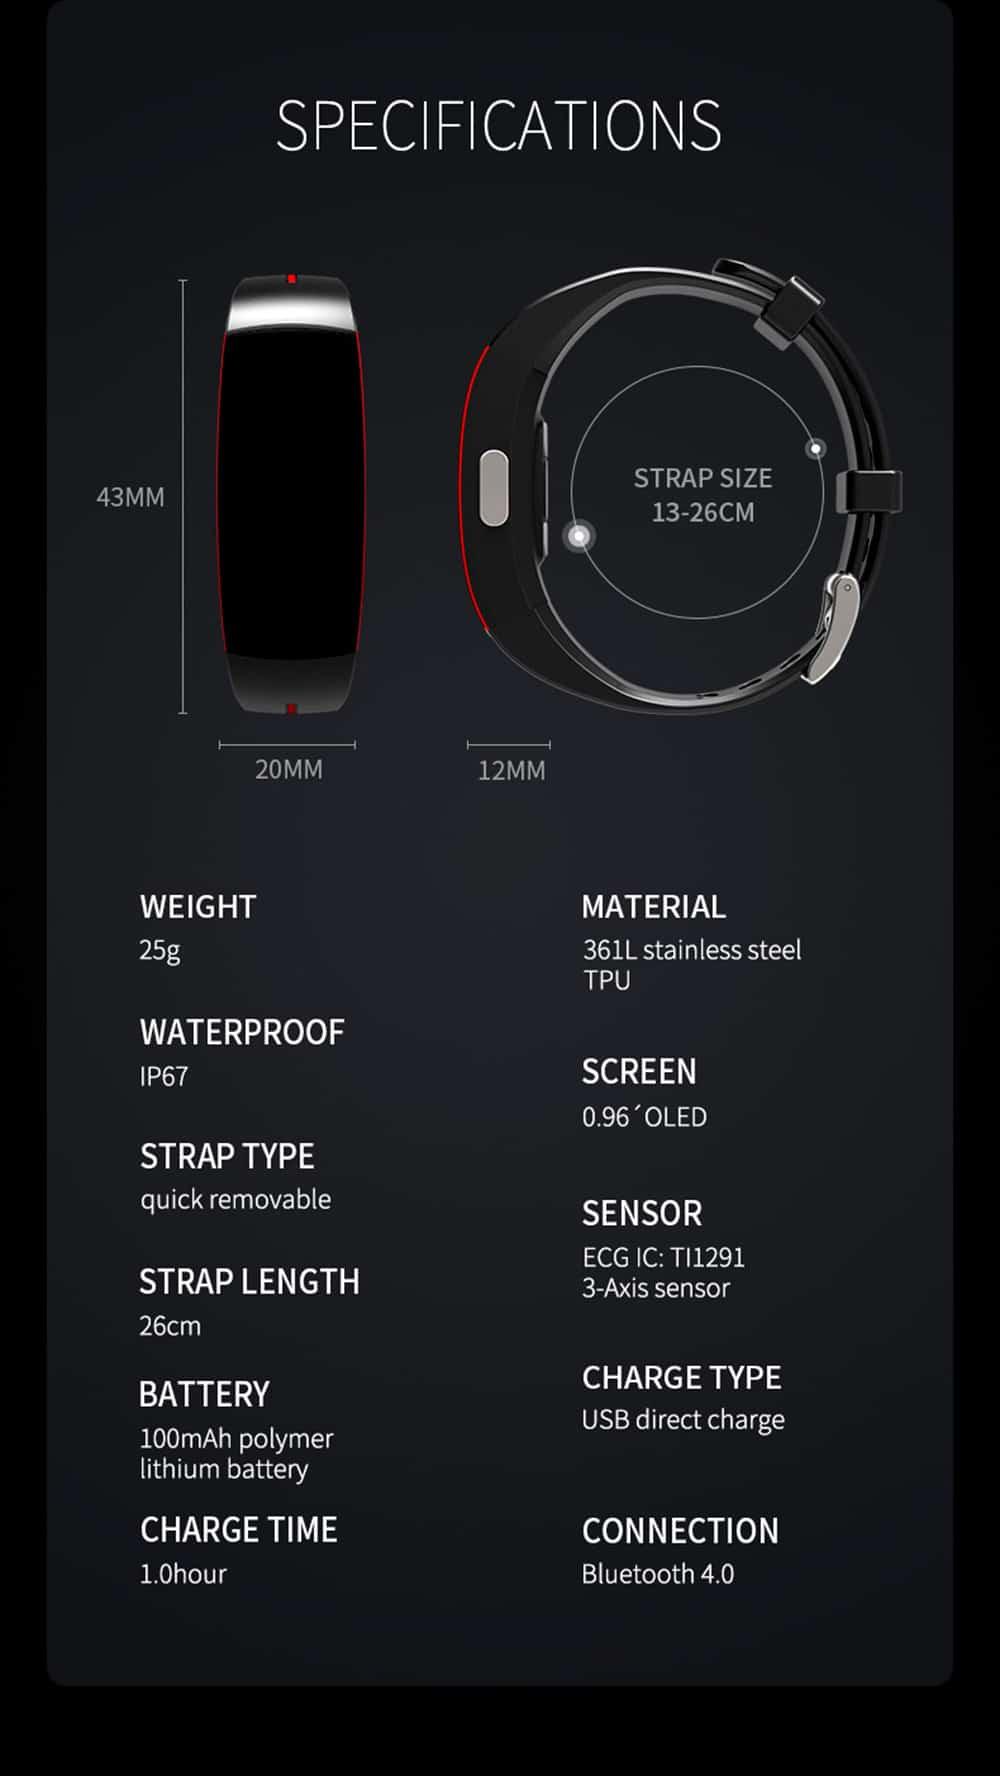 MHKBD PPG ECG Blood Pressure Bracelet IP67 Waterproof Smart Wristband Sports Step Heart Rate Monitoring Wrist Watch KBD0020